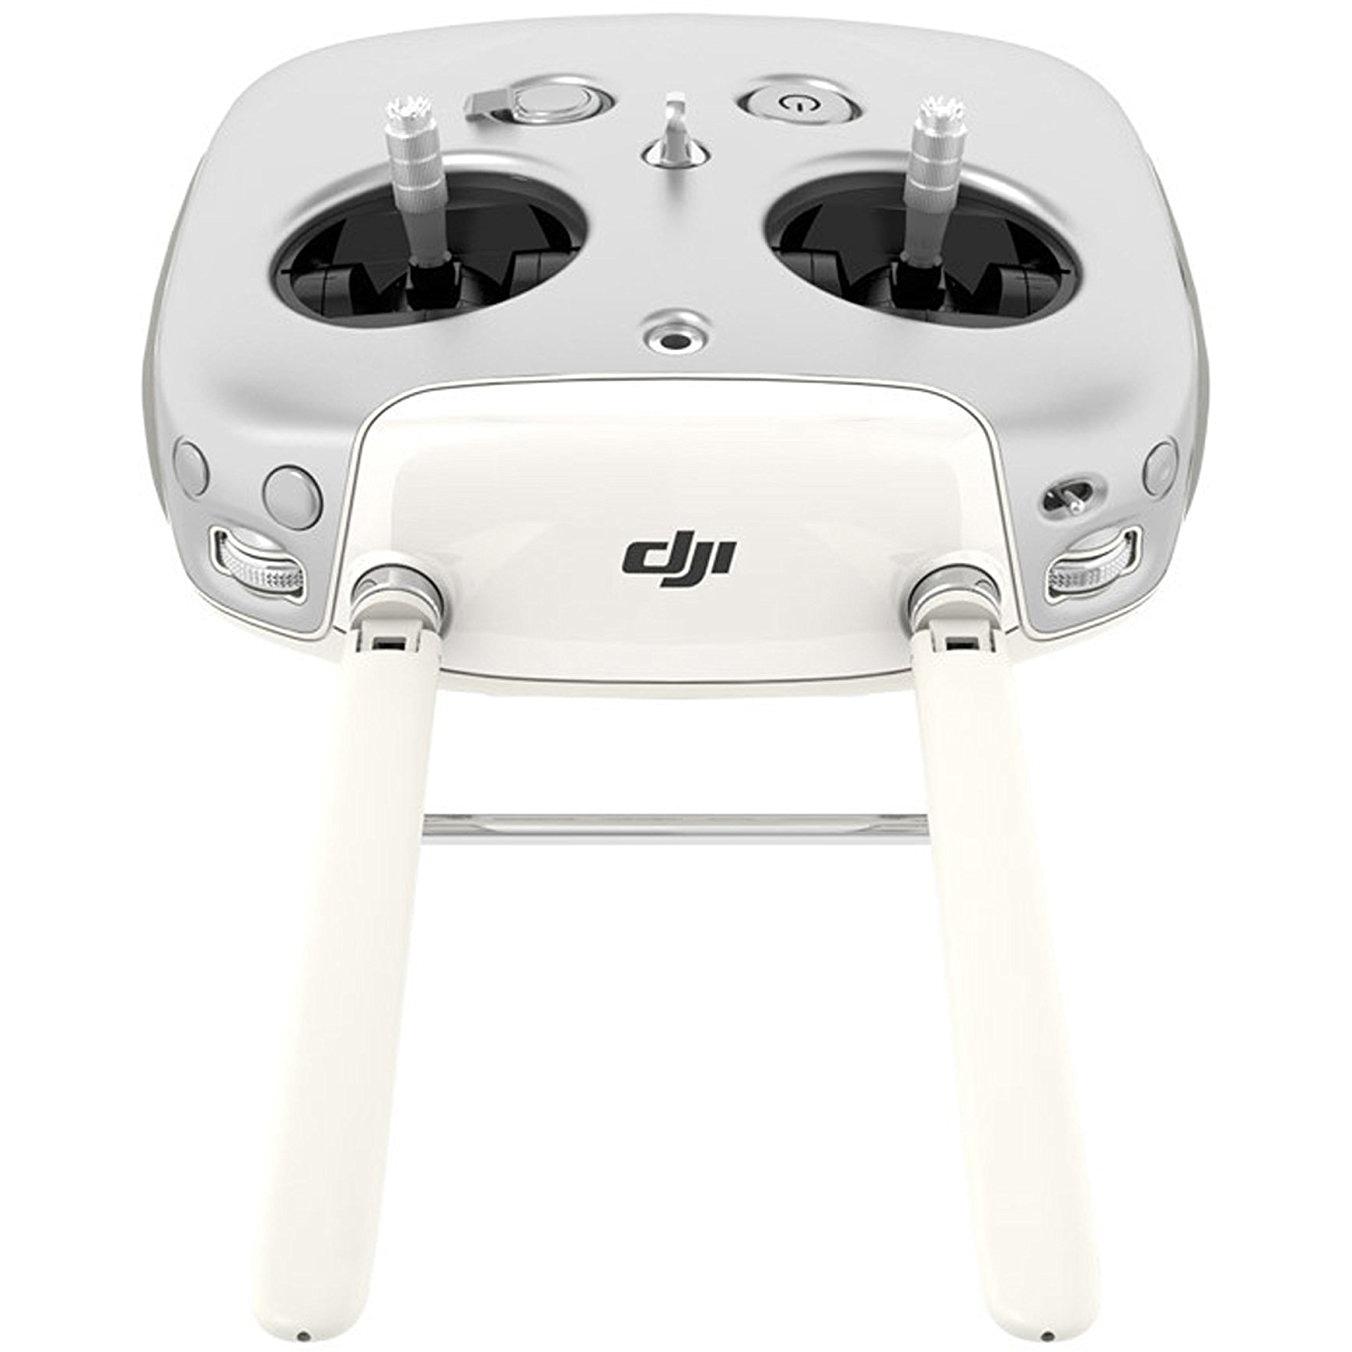 Пульт ДУ DJI Remote Controller для Inspire 1-2